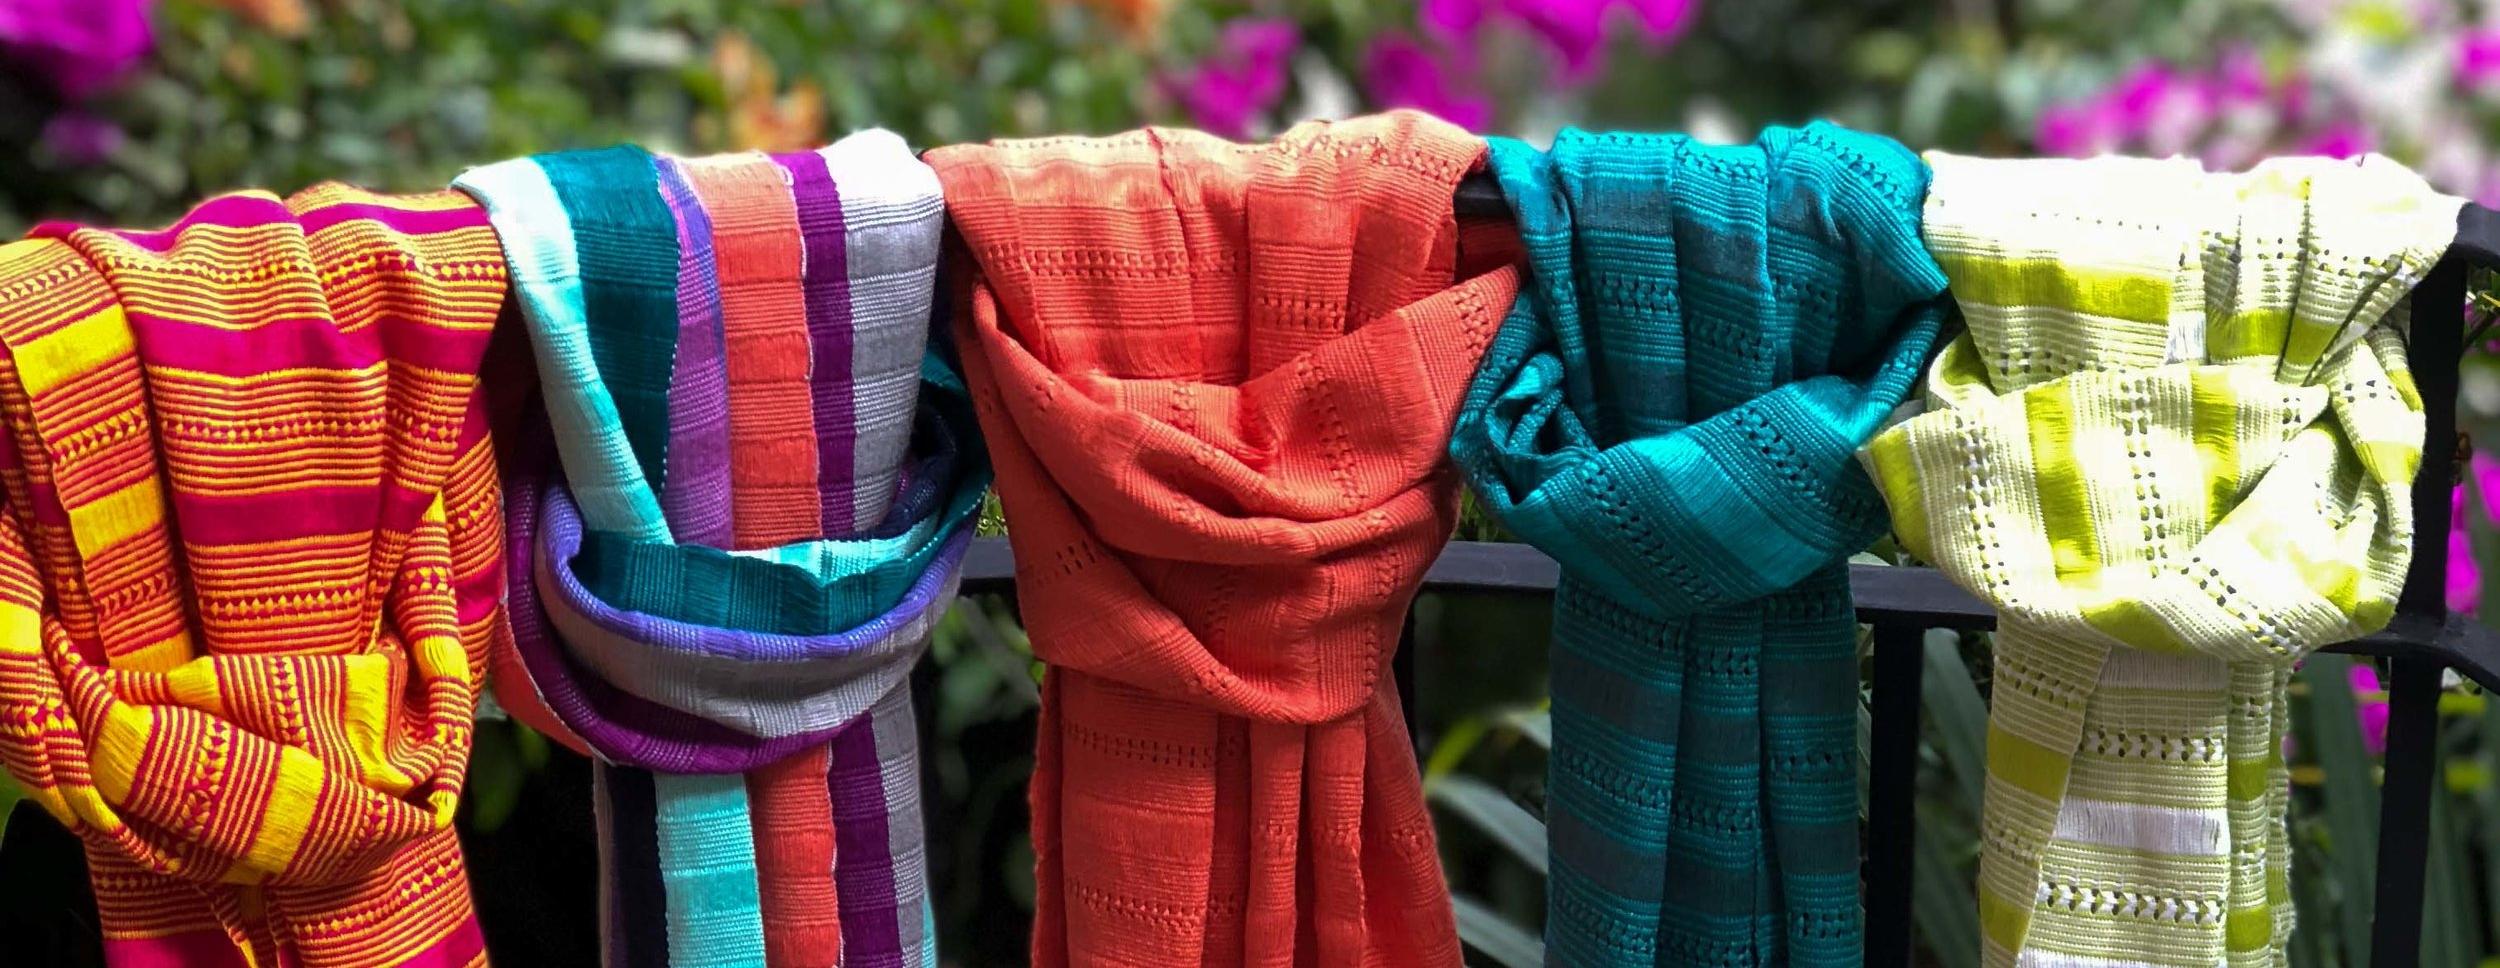 clothing-Amigos scarves5-0886.jpg